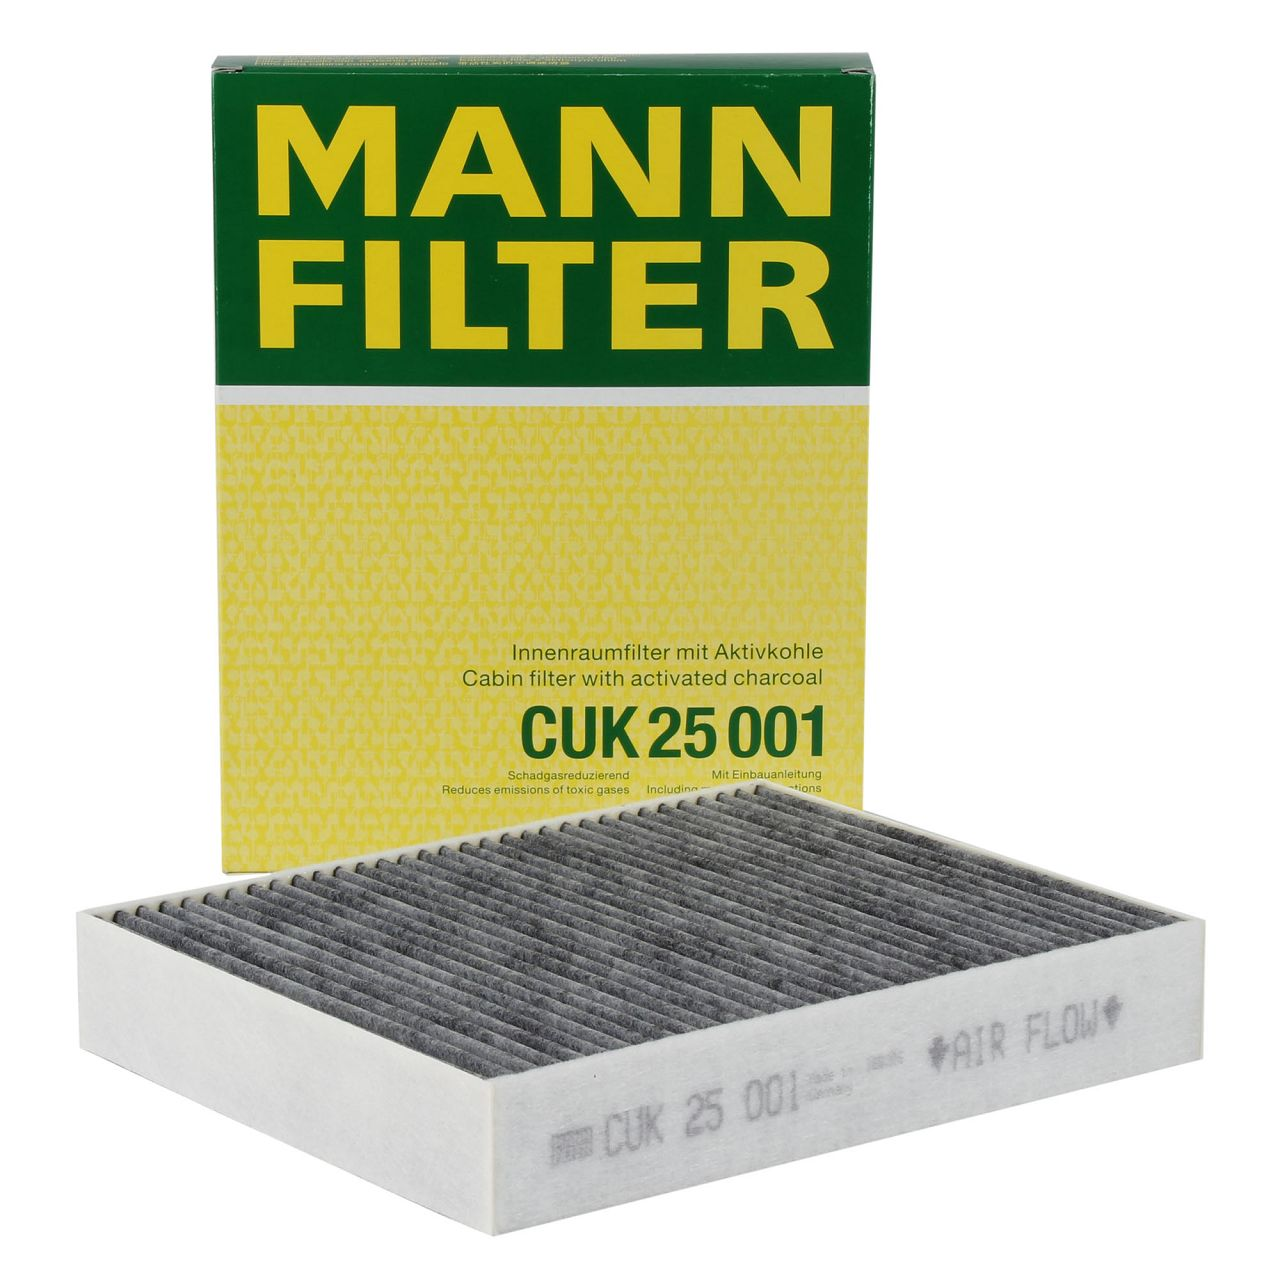 MANN Innenraumfilter Aktivkohle CUK25001 für BMW F20 F21 F22 F23 F30-34 F32-36